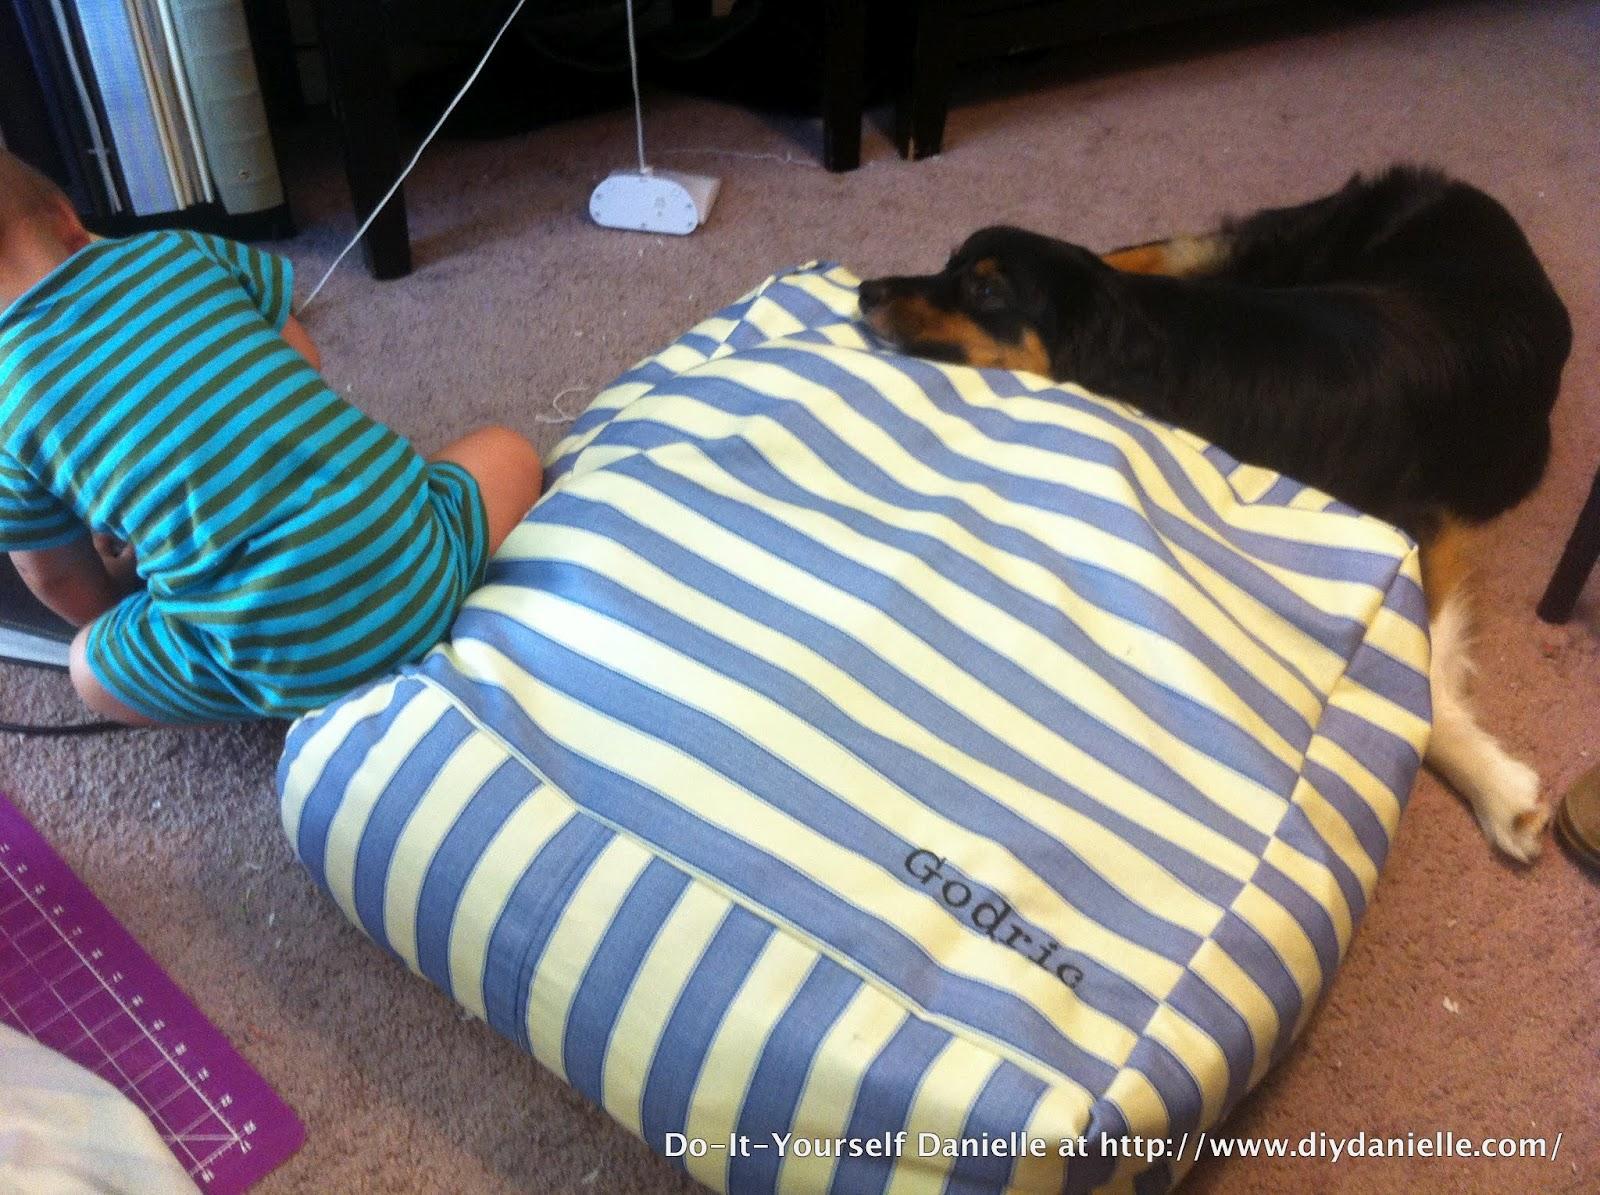 Diy Toddler Floor Pillow Diy Danielle